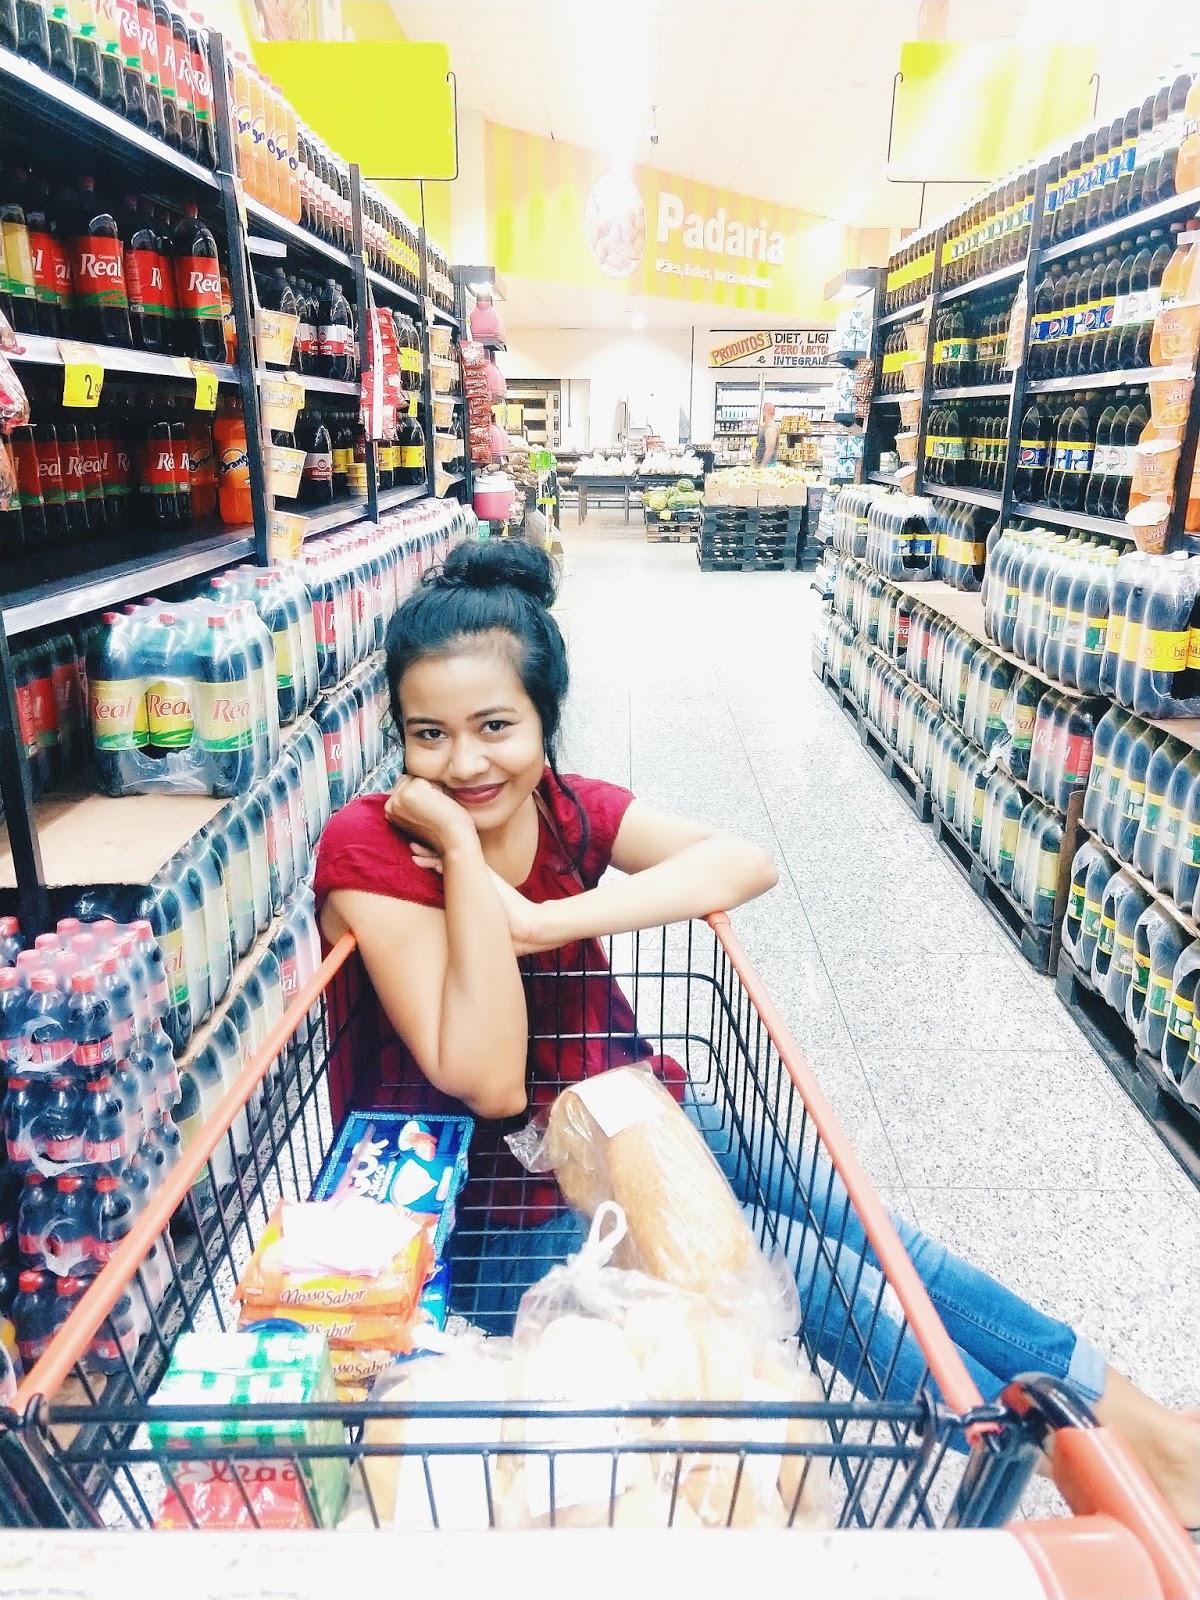 Vida de adulto, dicas de supermercado para iniciantes